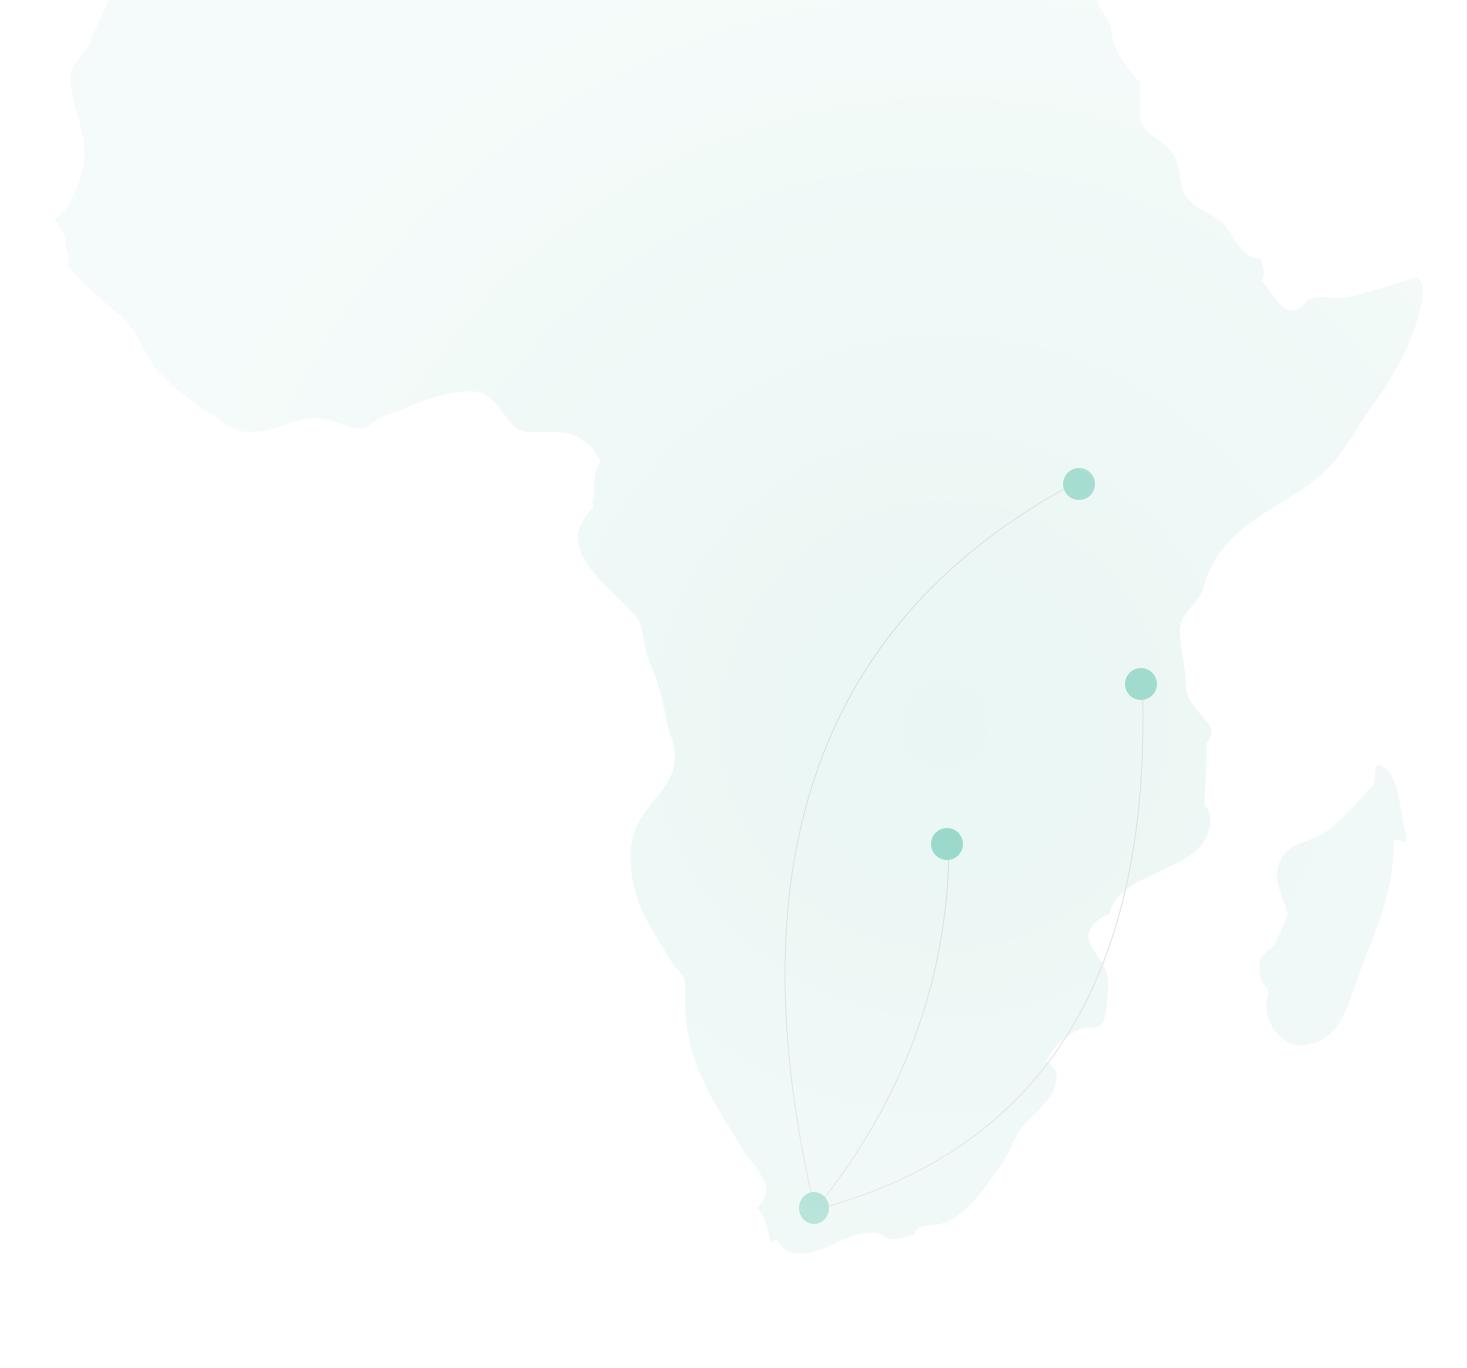 unifi group - map